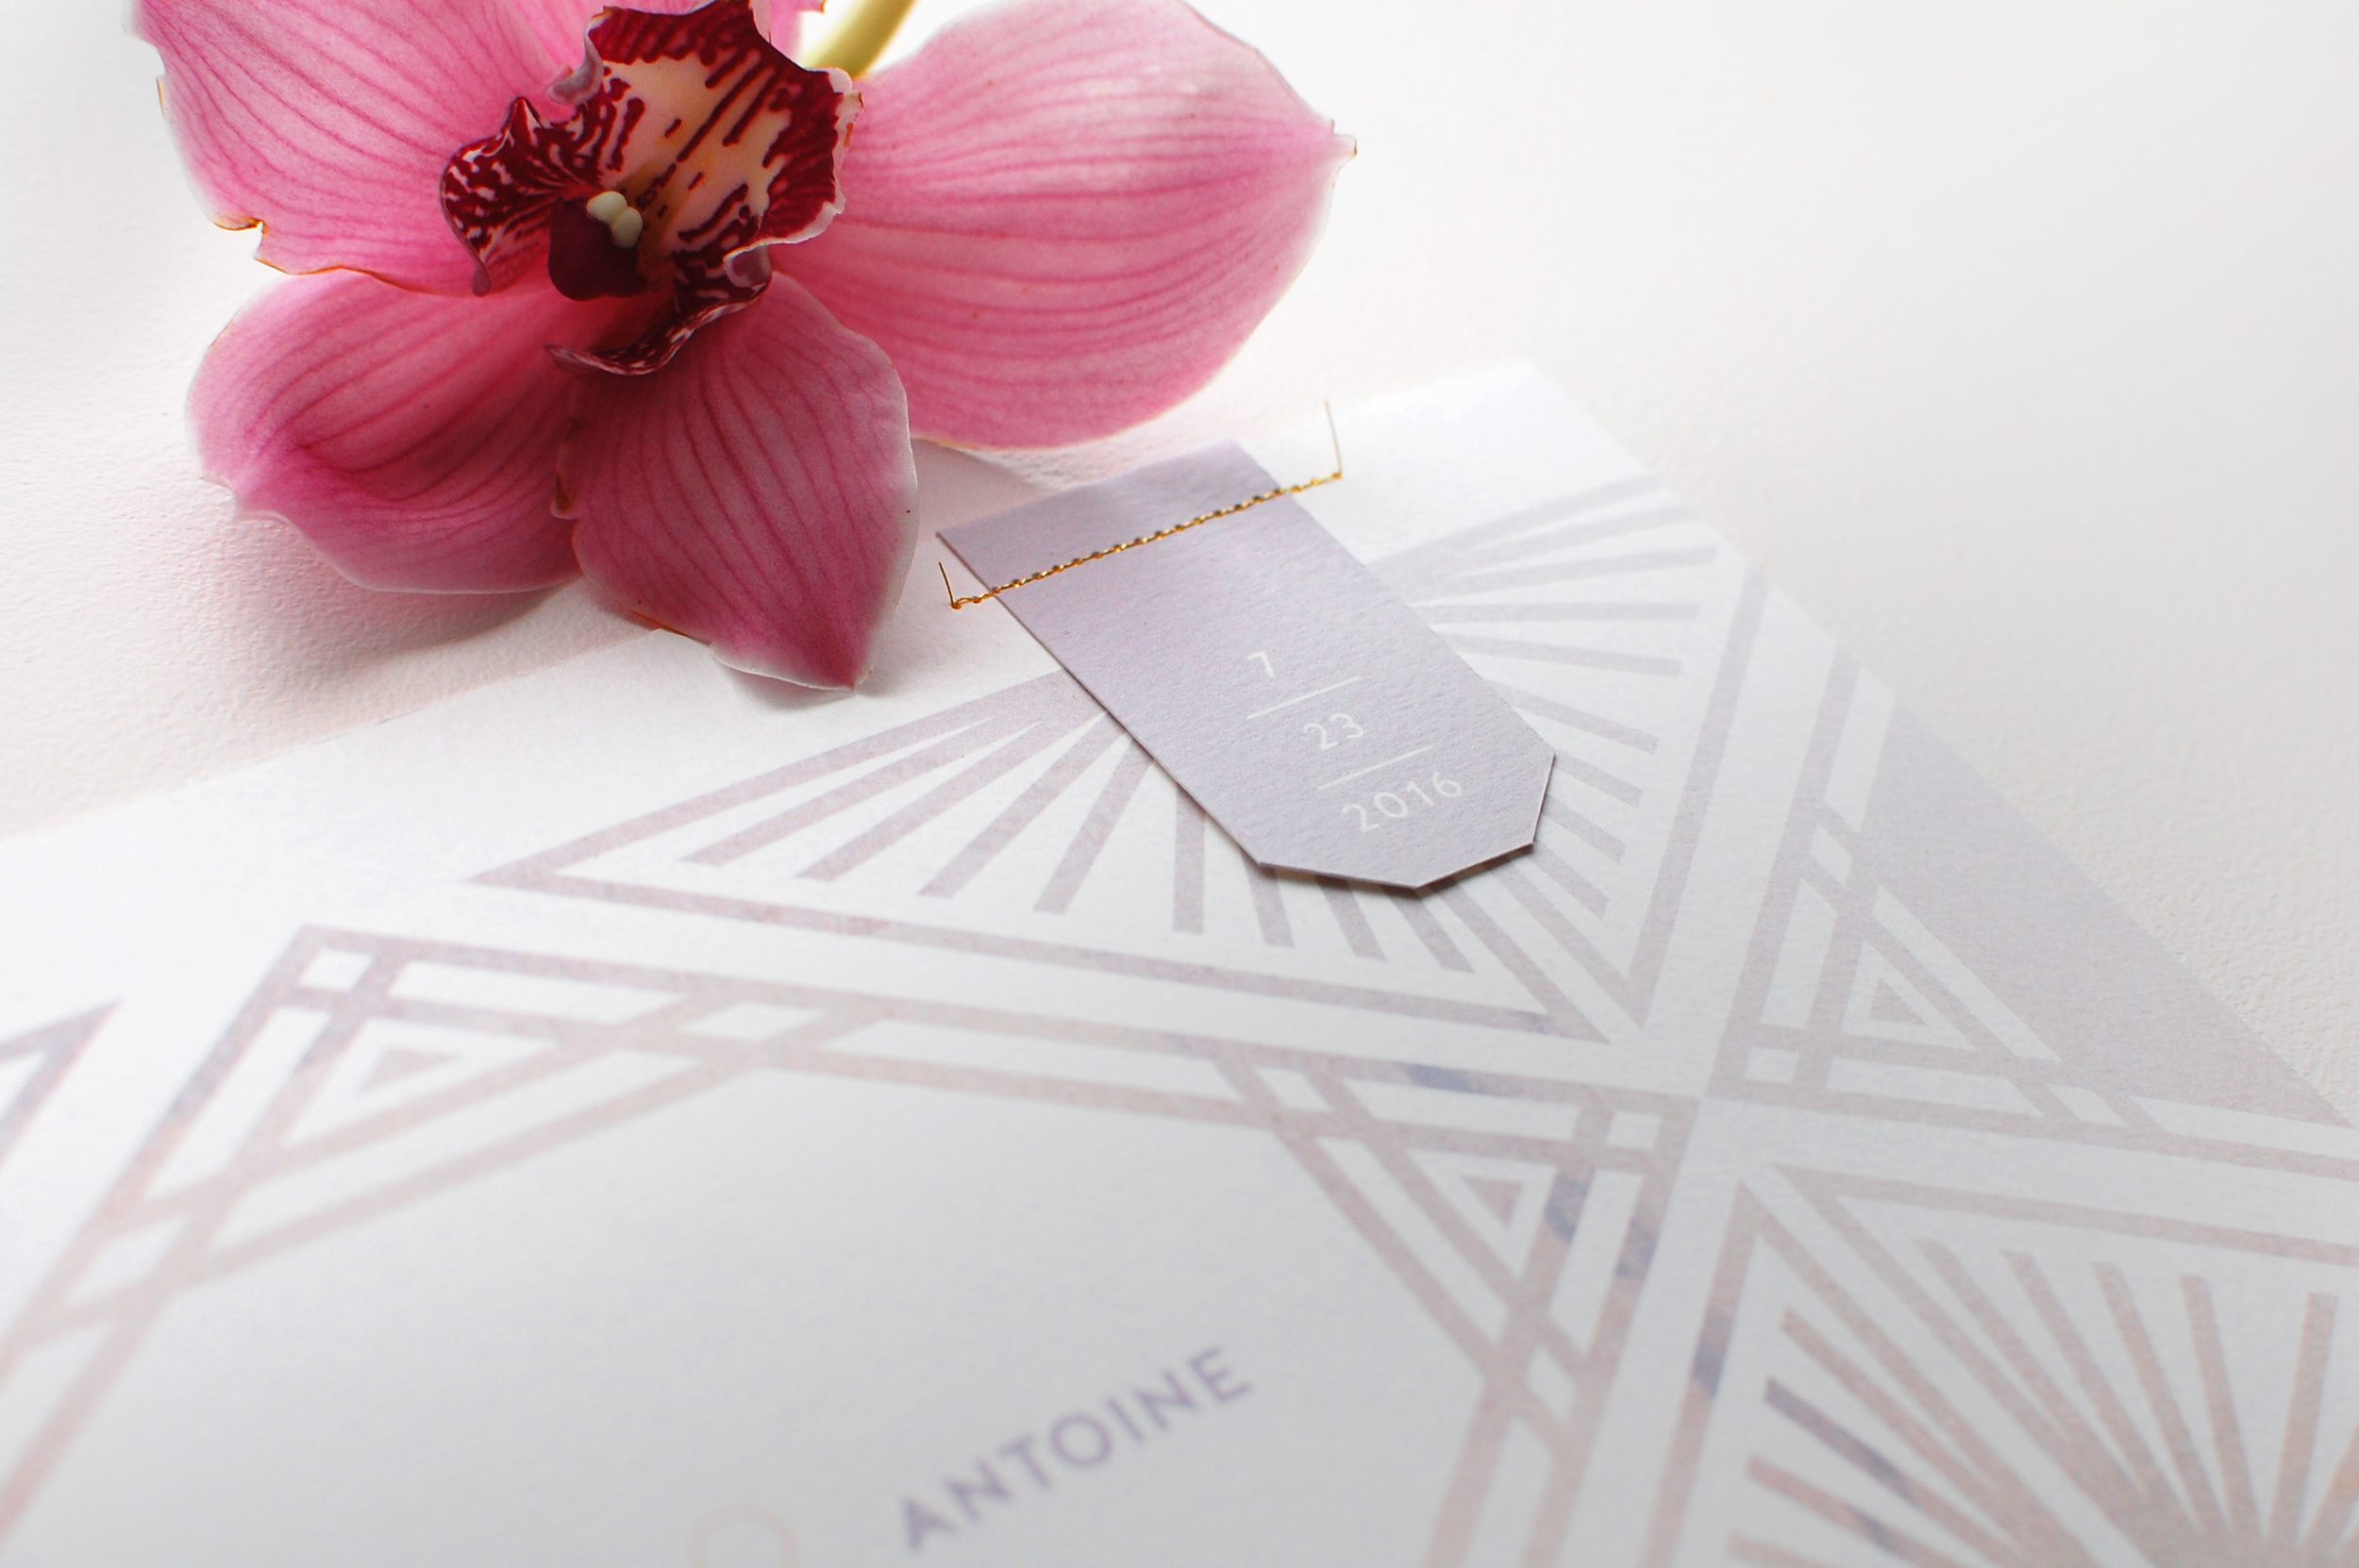 Luxury Fine Art Wedding Invitations at LaFabere.com